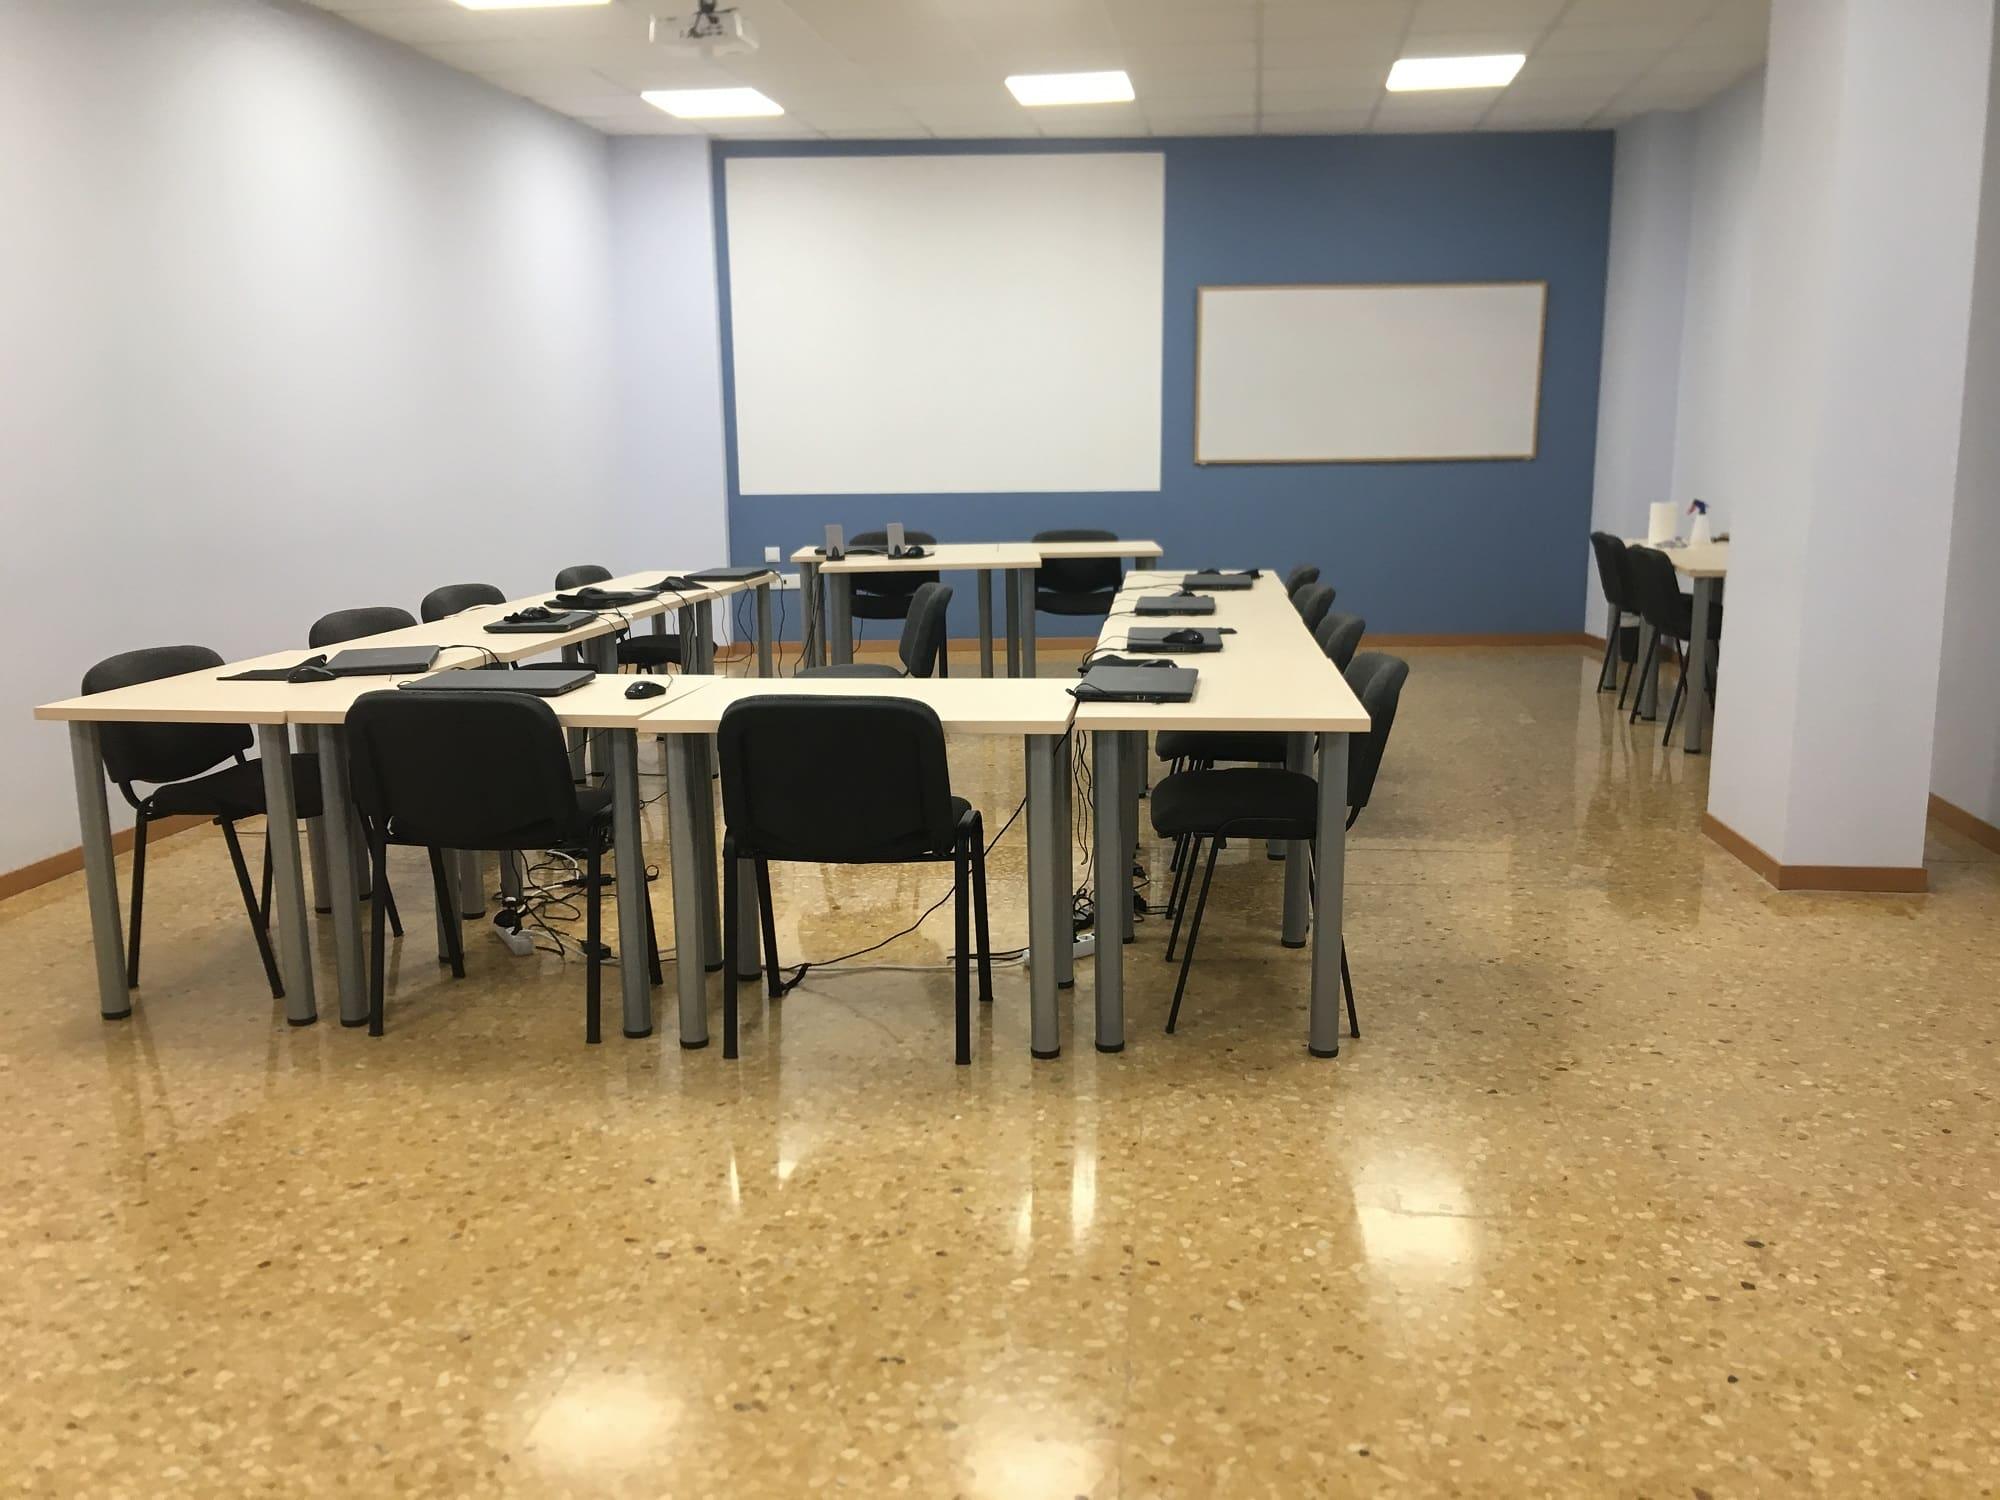 AREA FORMACION VALENCIA - CENTRO POETA ALBEROLA - AULAS_ORDENADORES 2000X1500-min